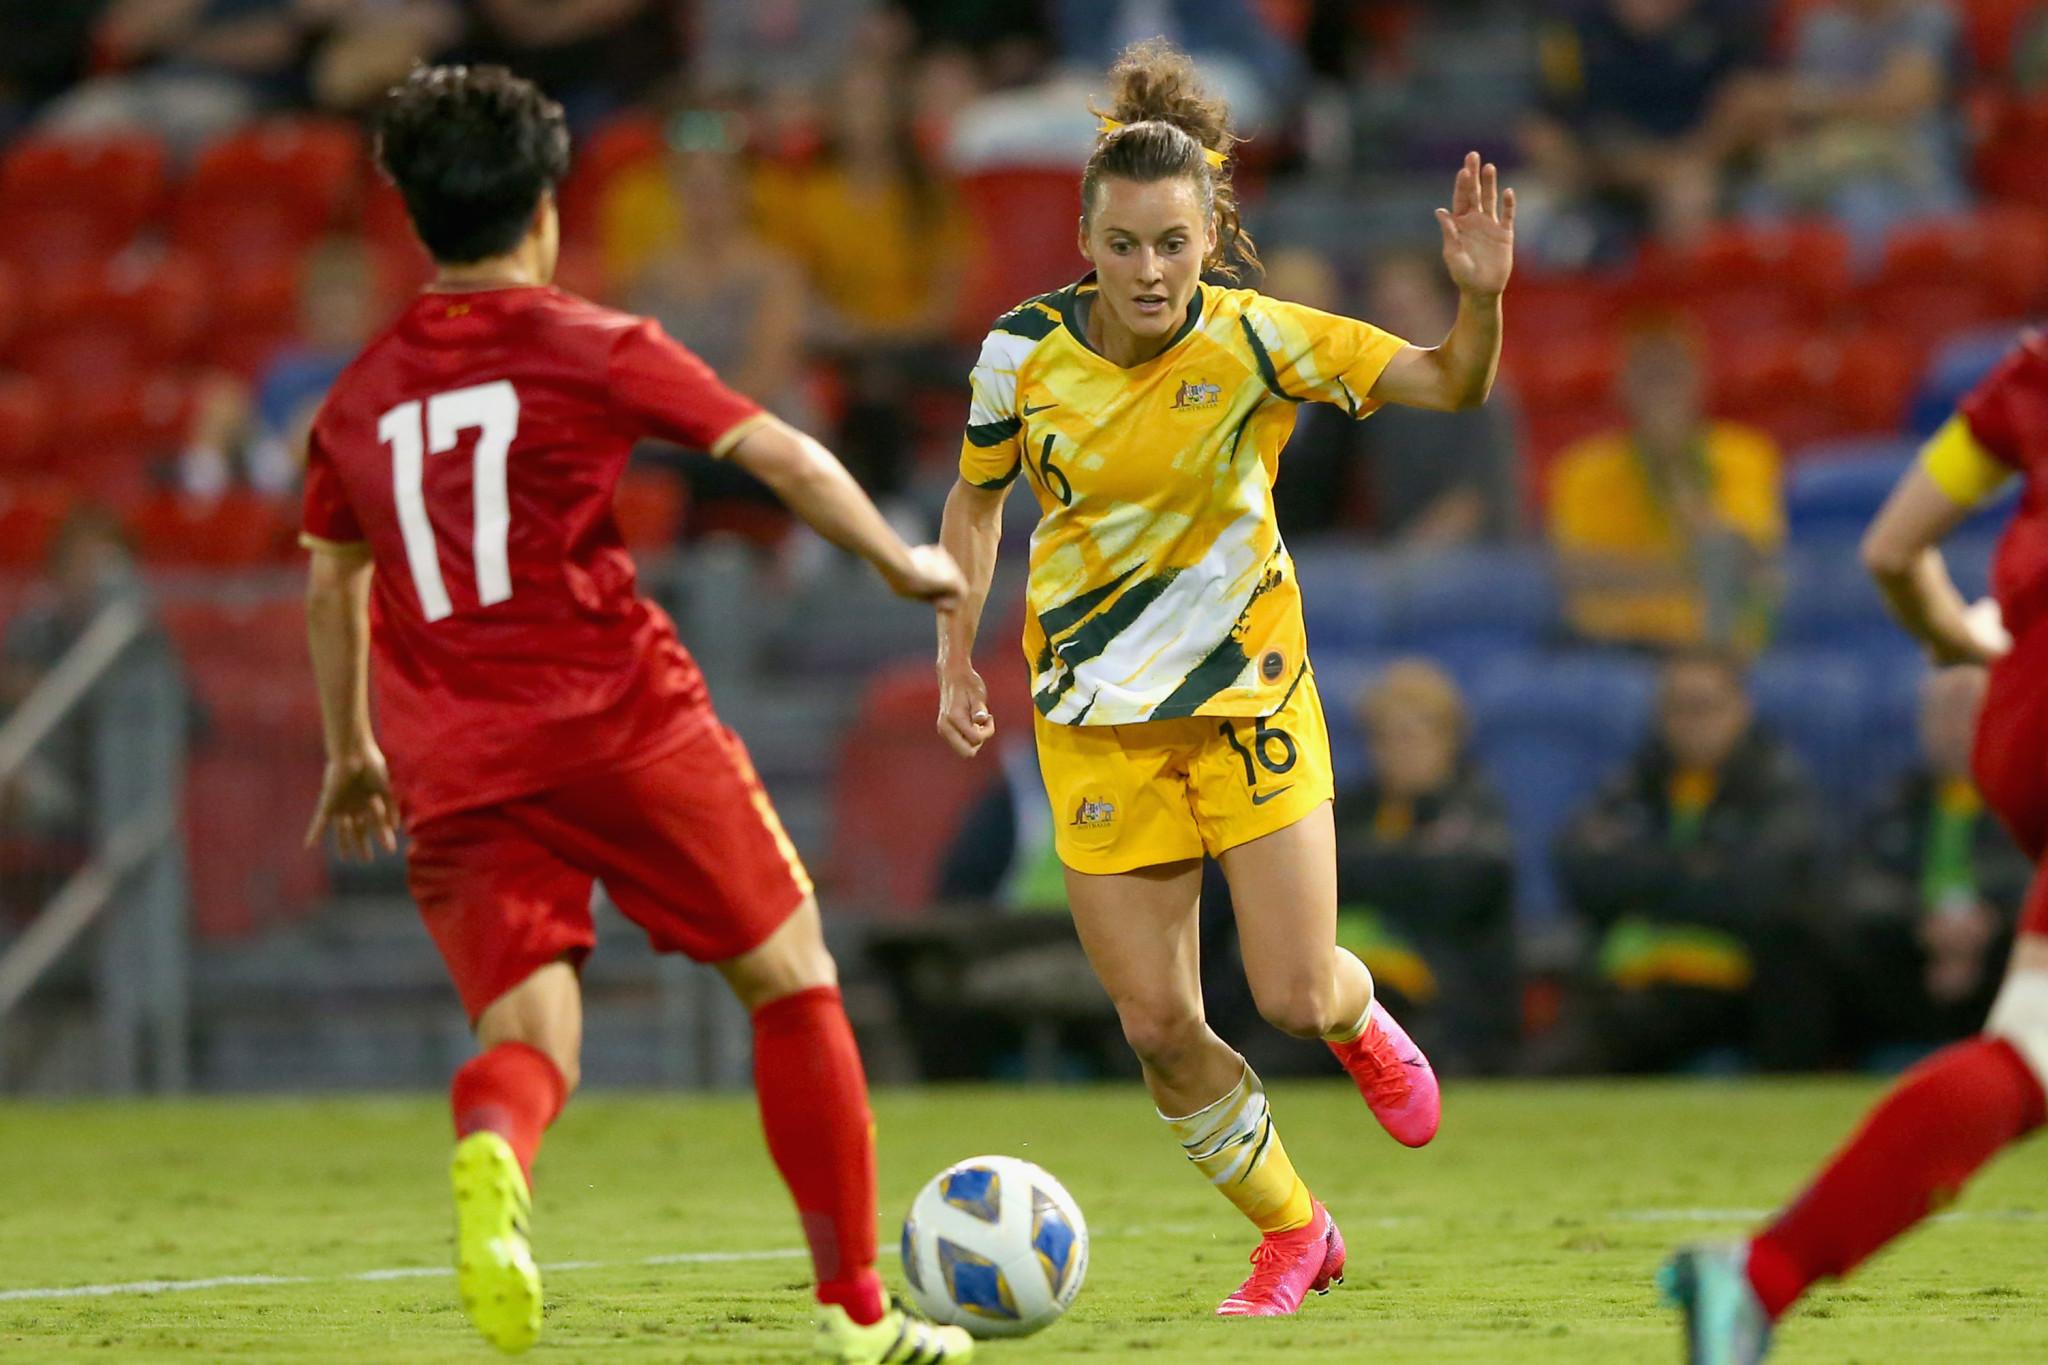 Australia thrash Vietnam in first leg of Olympic football playoff